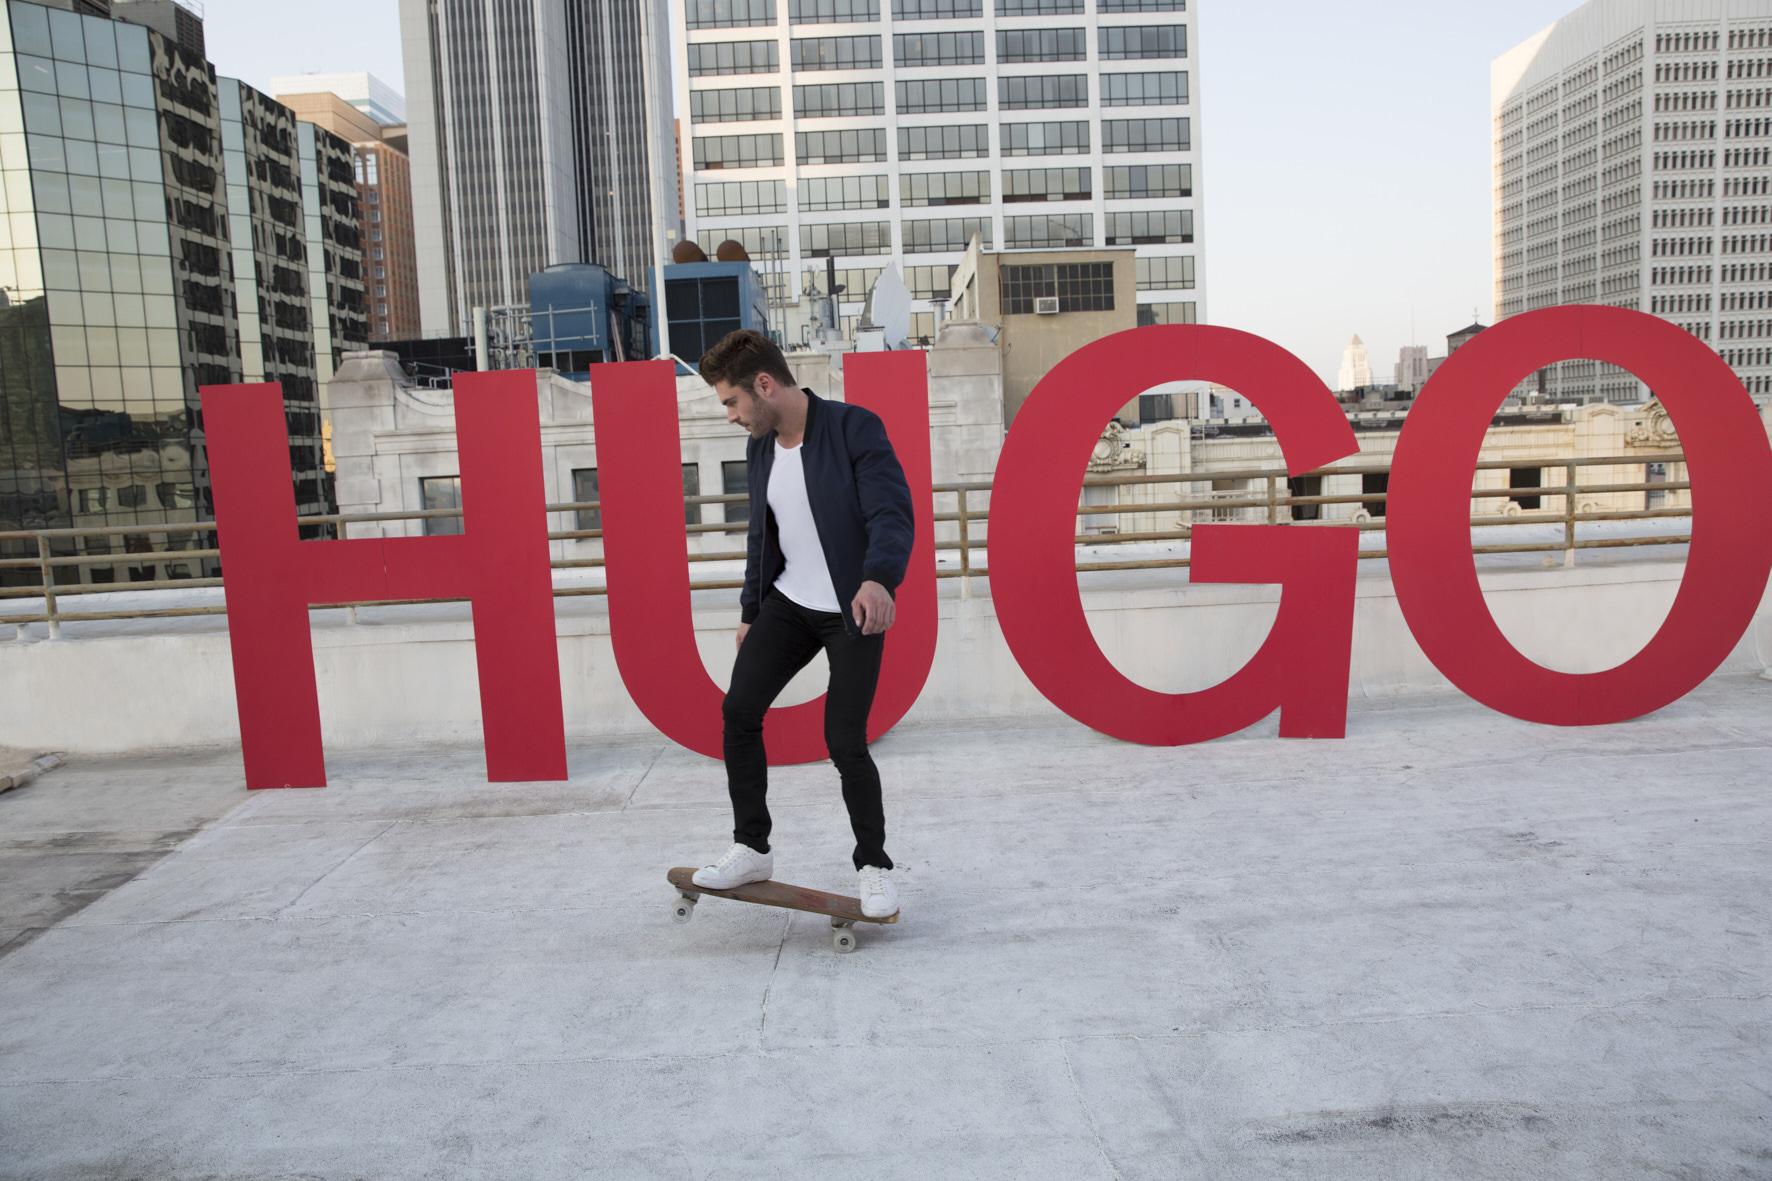 Tommeezjerry-Fashionblog-Styleblog-Maennermodeblog-Hugo-Boss-Giveaway-Meet-Zac-Efron